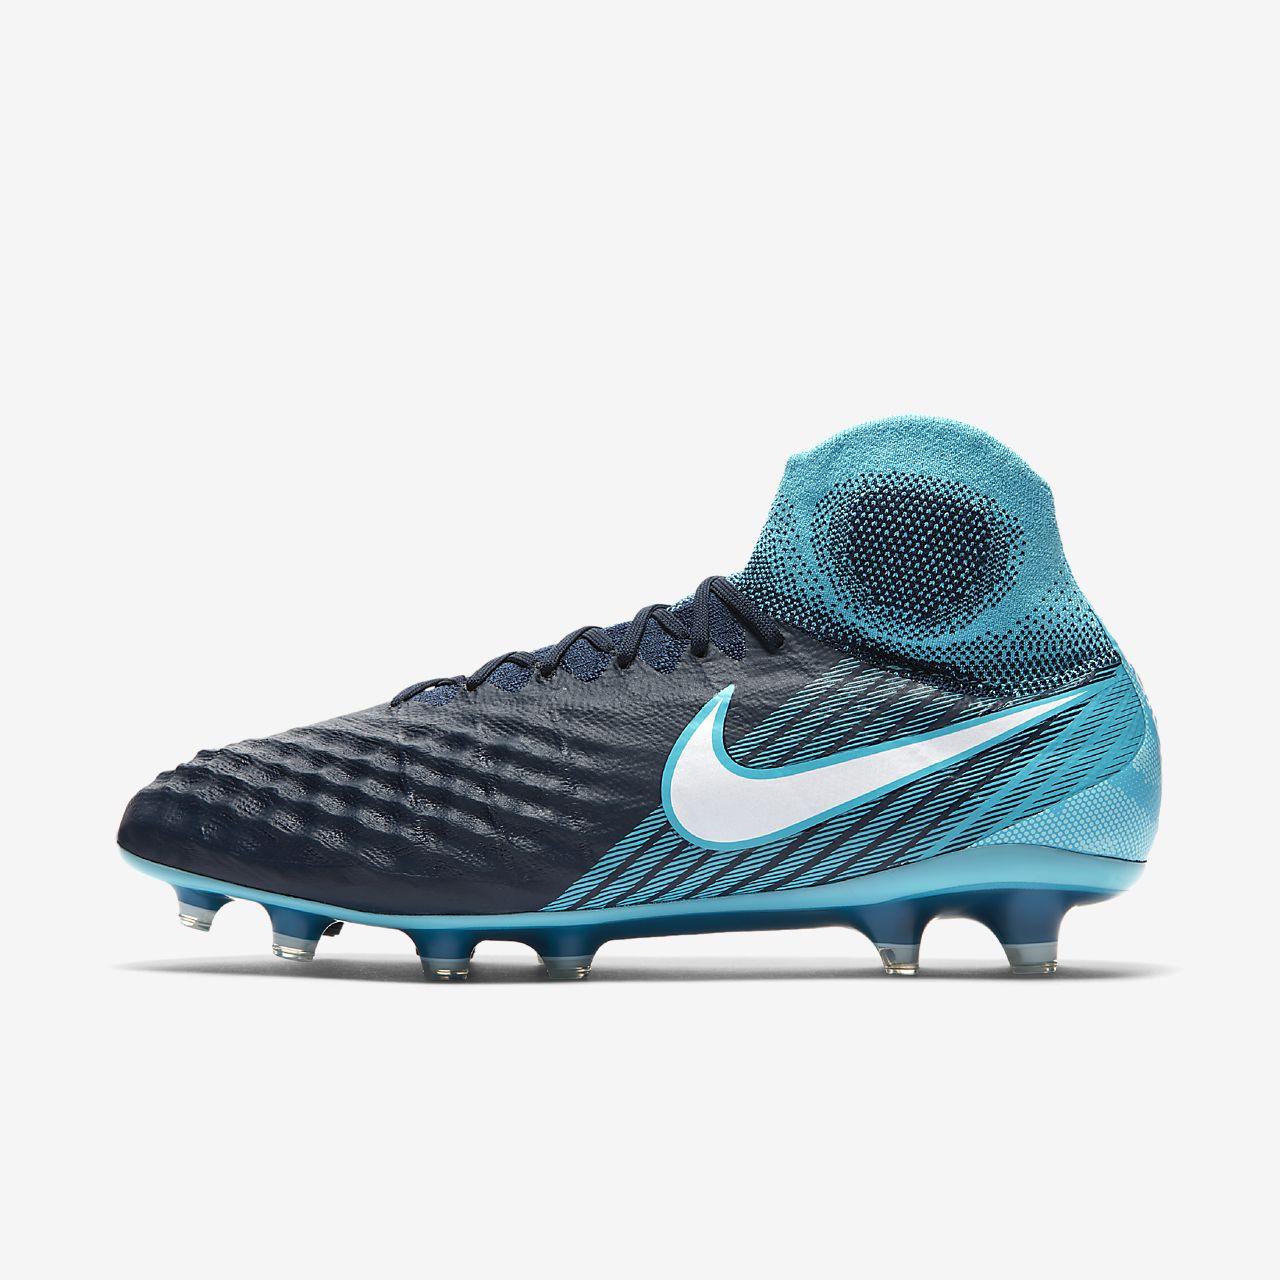 ... Nike Magista Obra II Firm-Ground Soccer Cleat